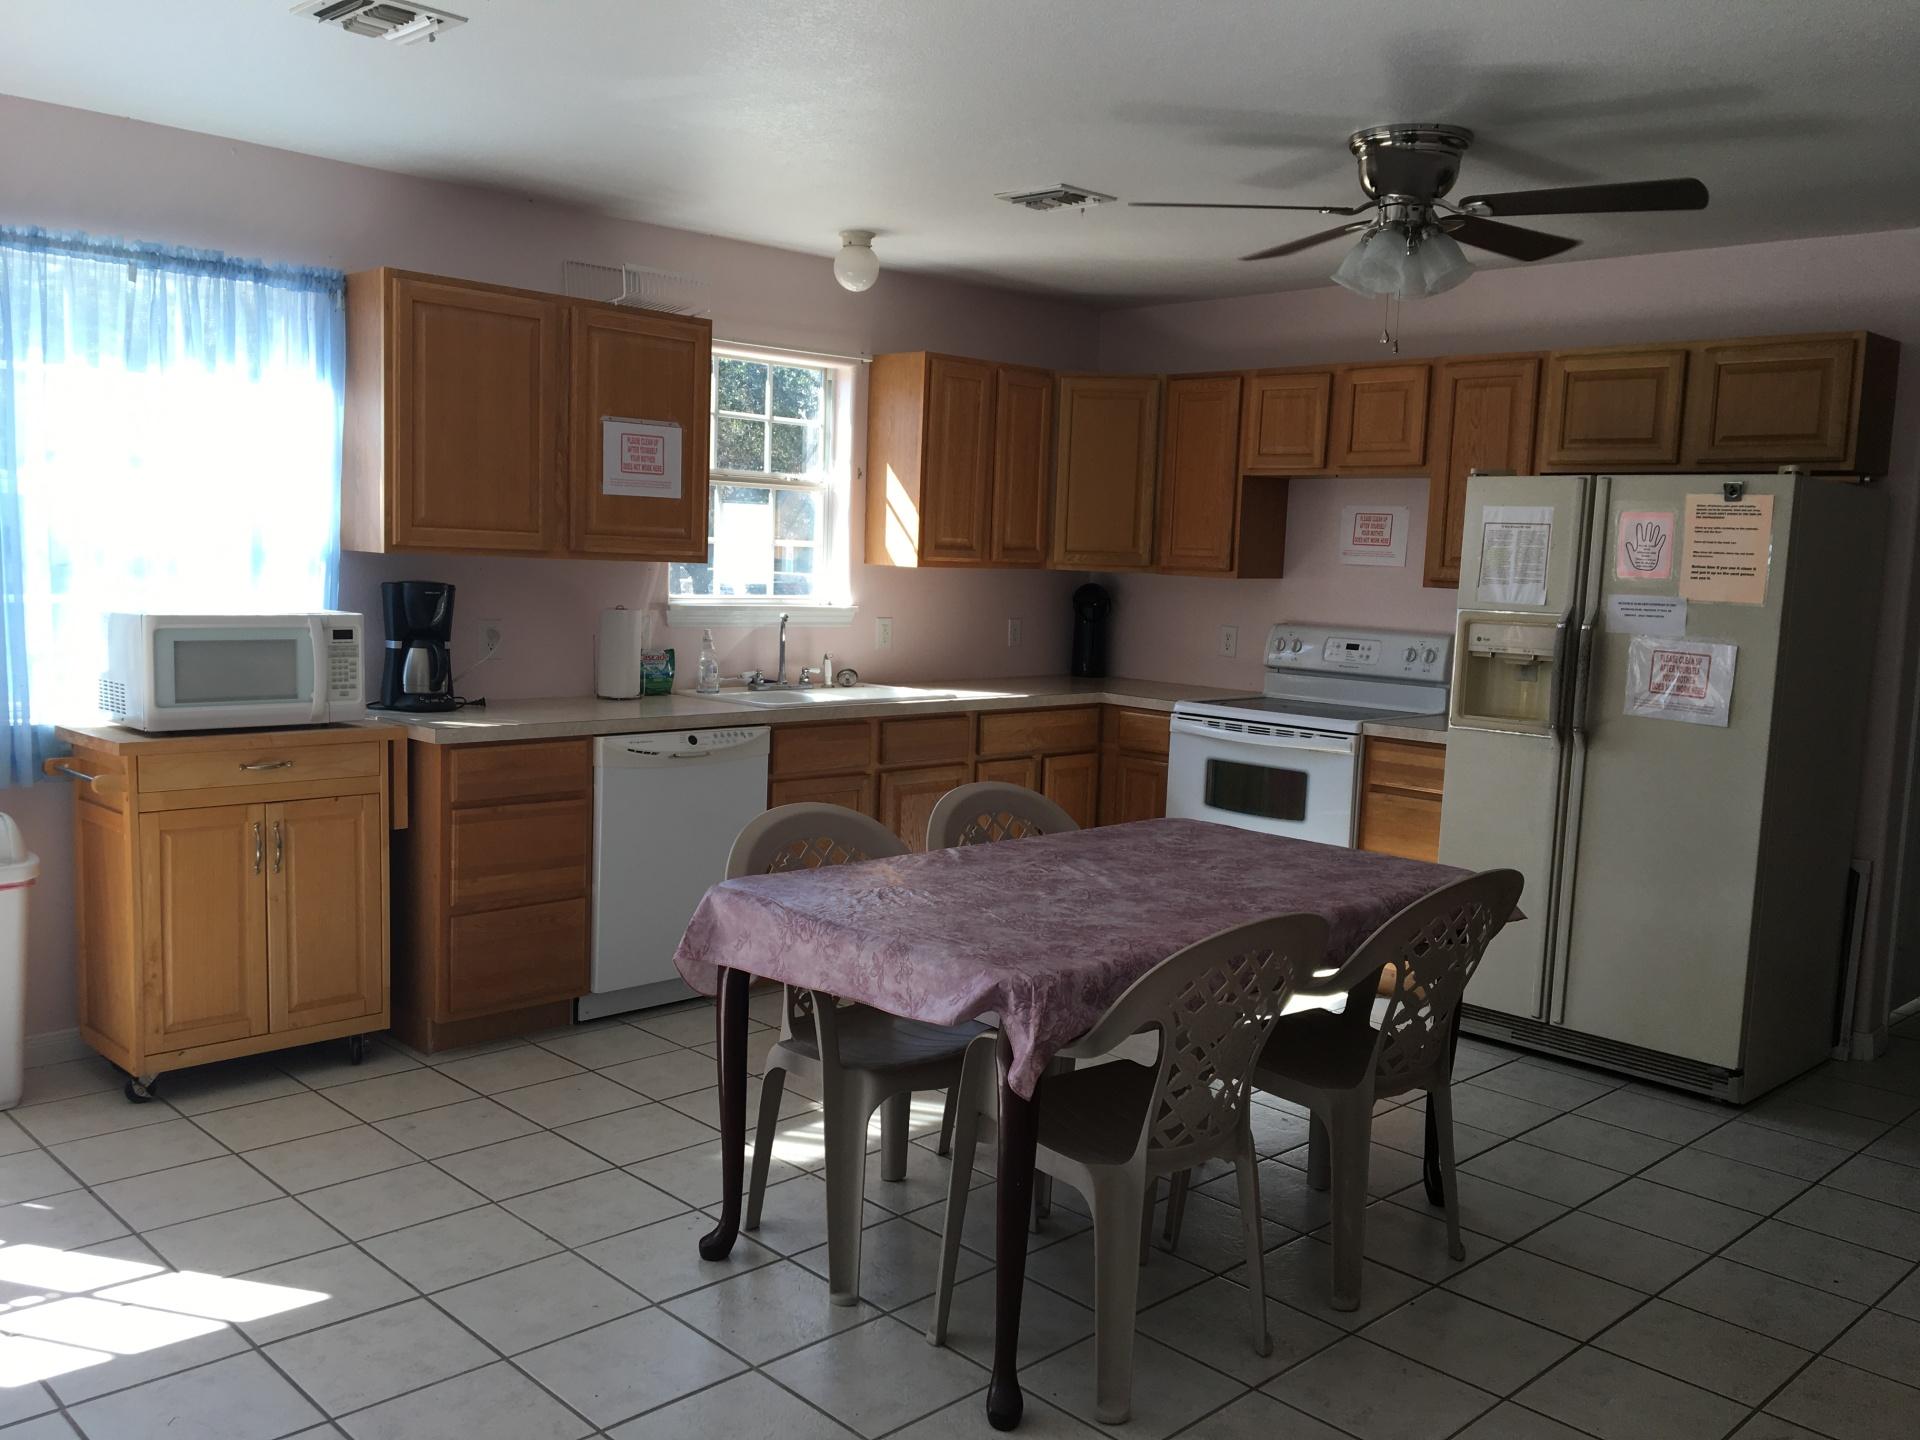 2 Full Kitchens